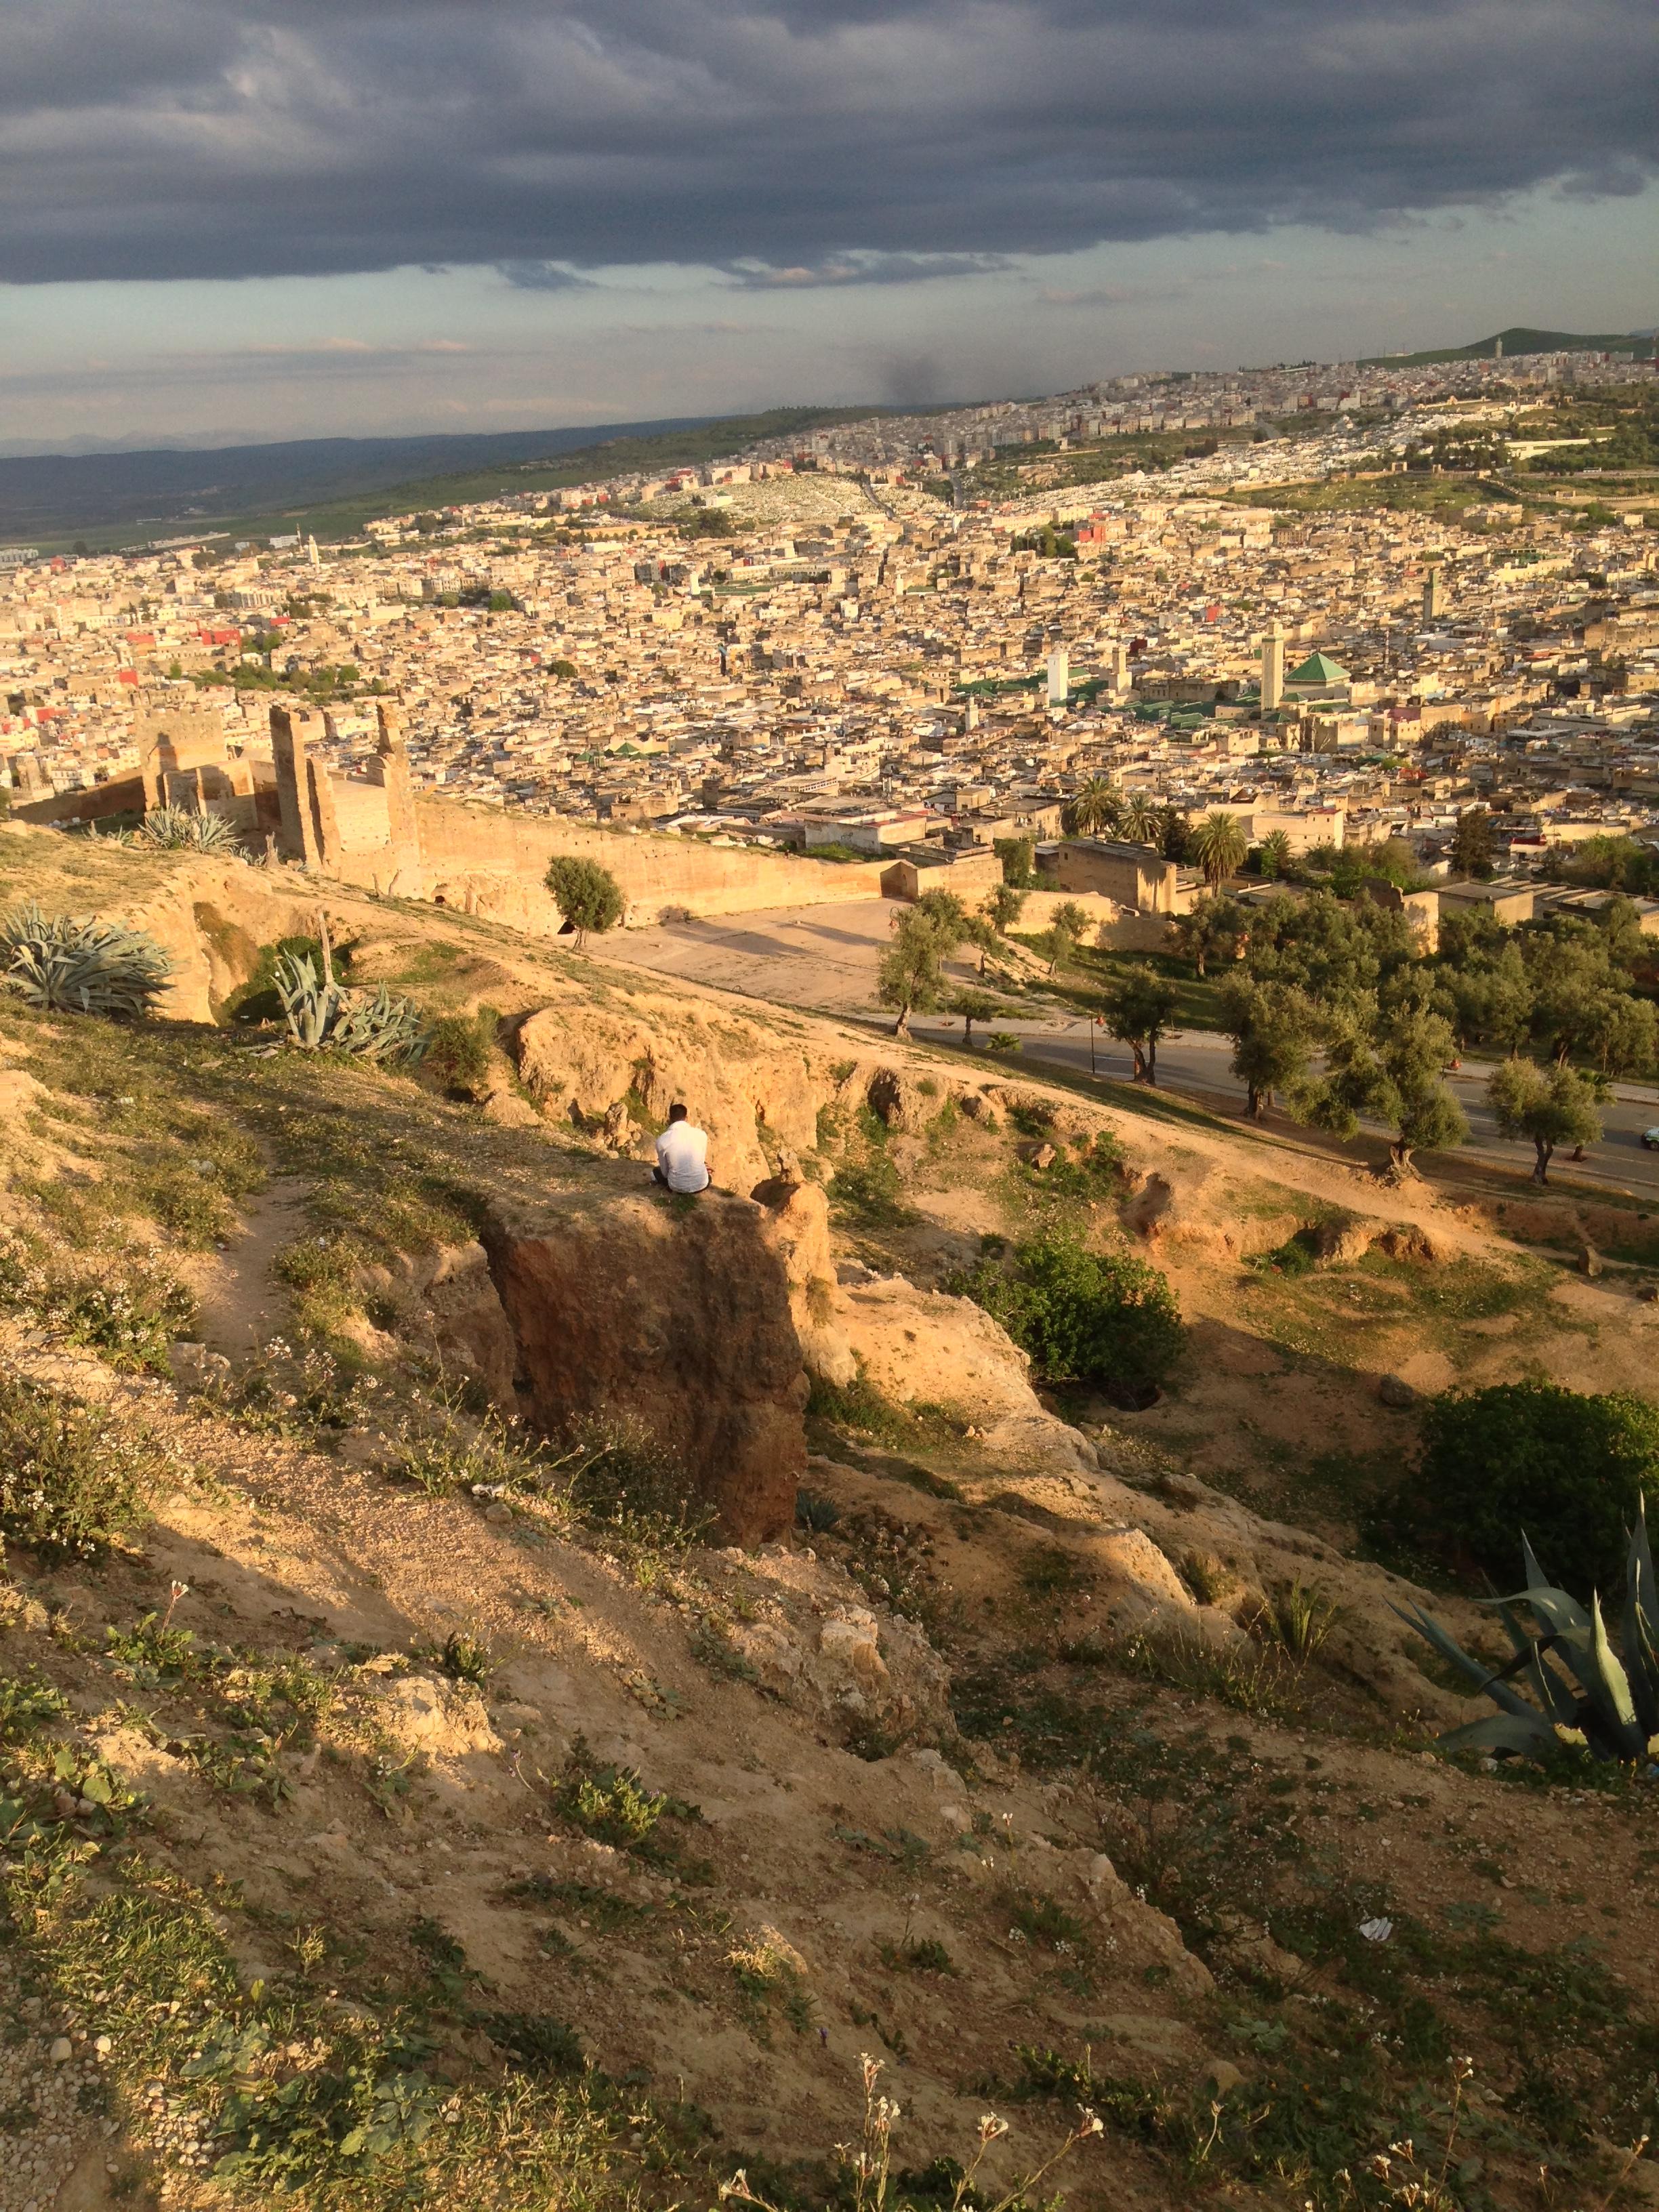 Pleasant walk round the Merinids Tombstones with stunning sight on the Medina of Fez